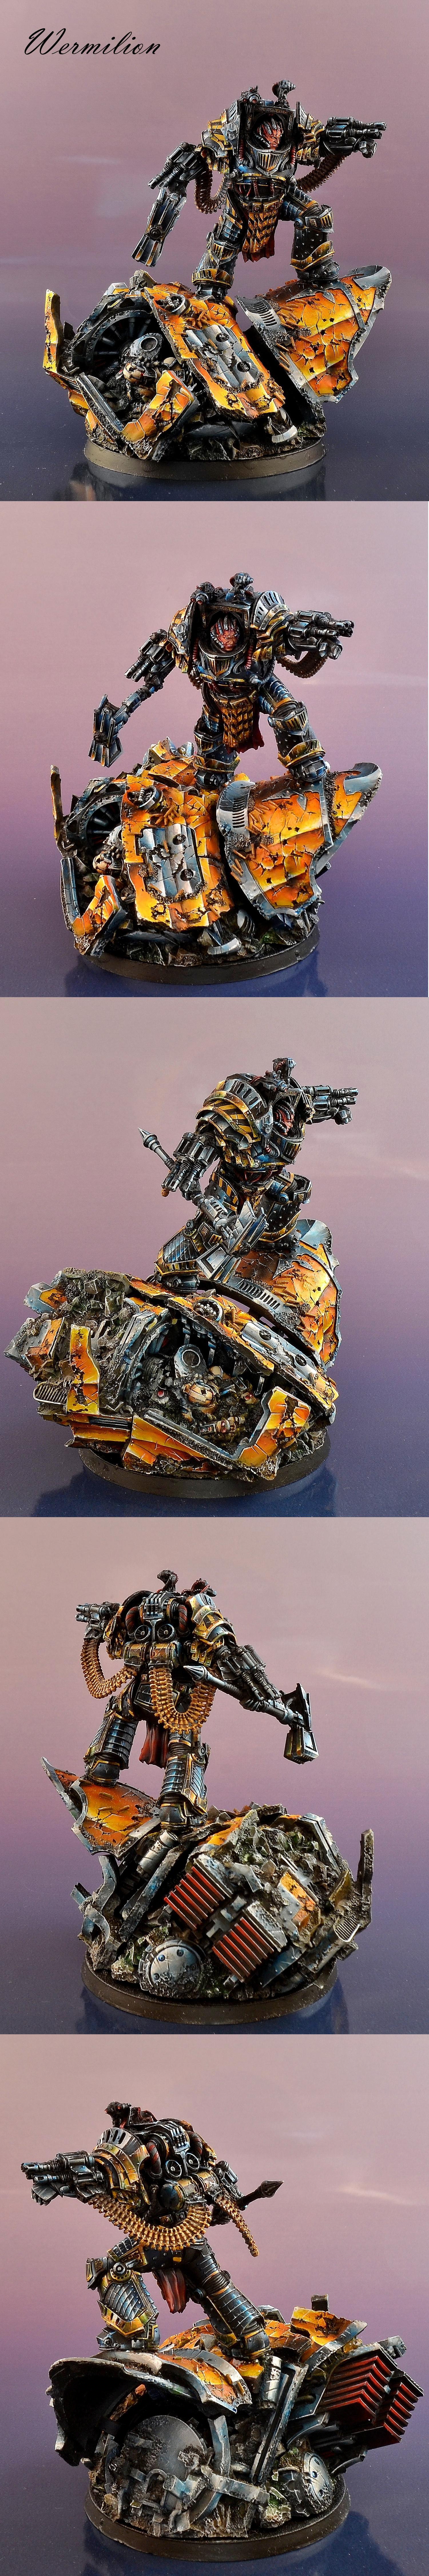 Heresy, Perturabo, Warhammer 40,000, Wh 400000